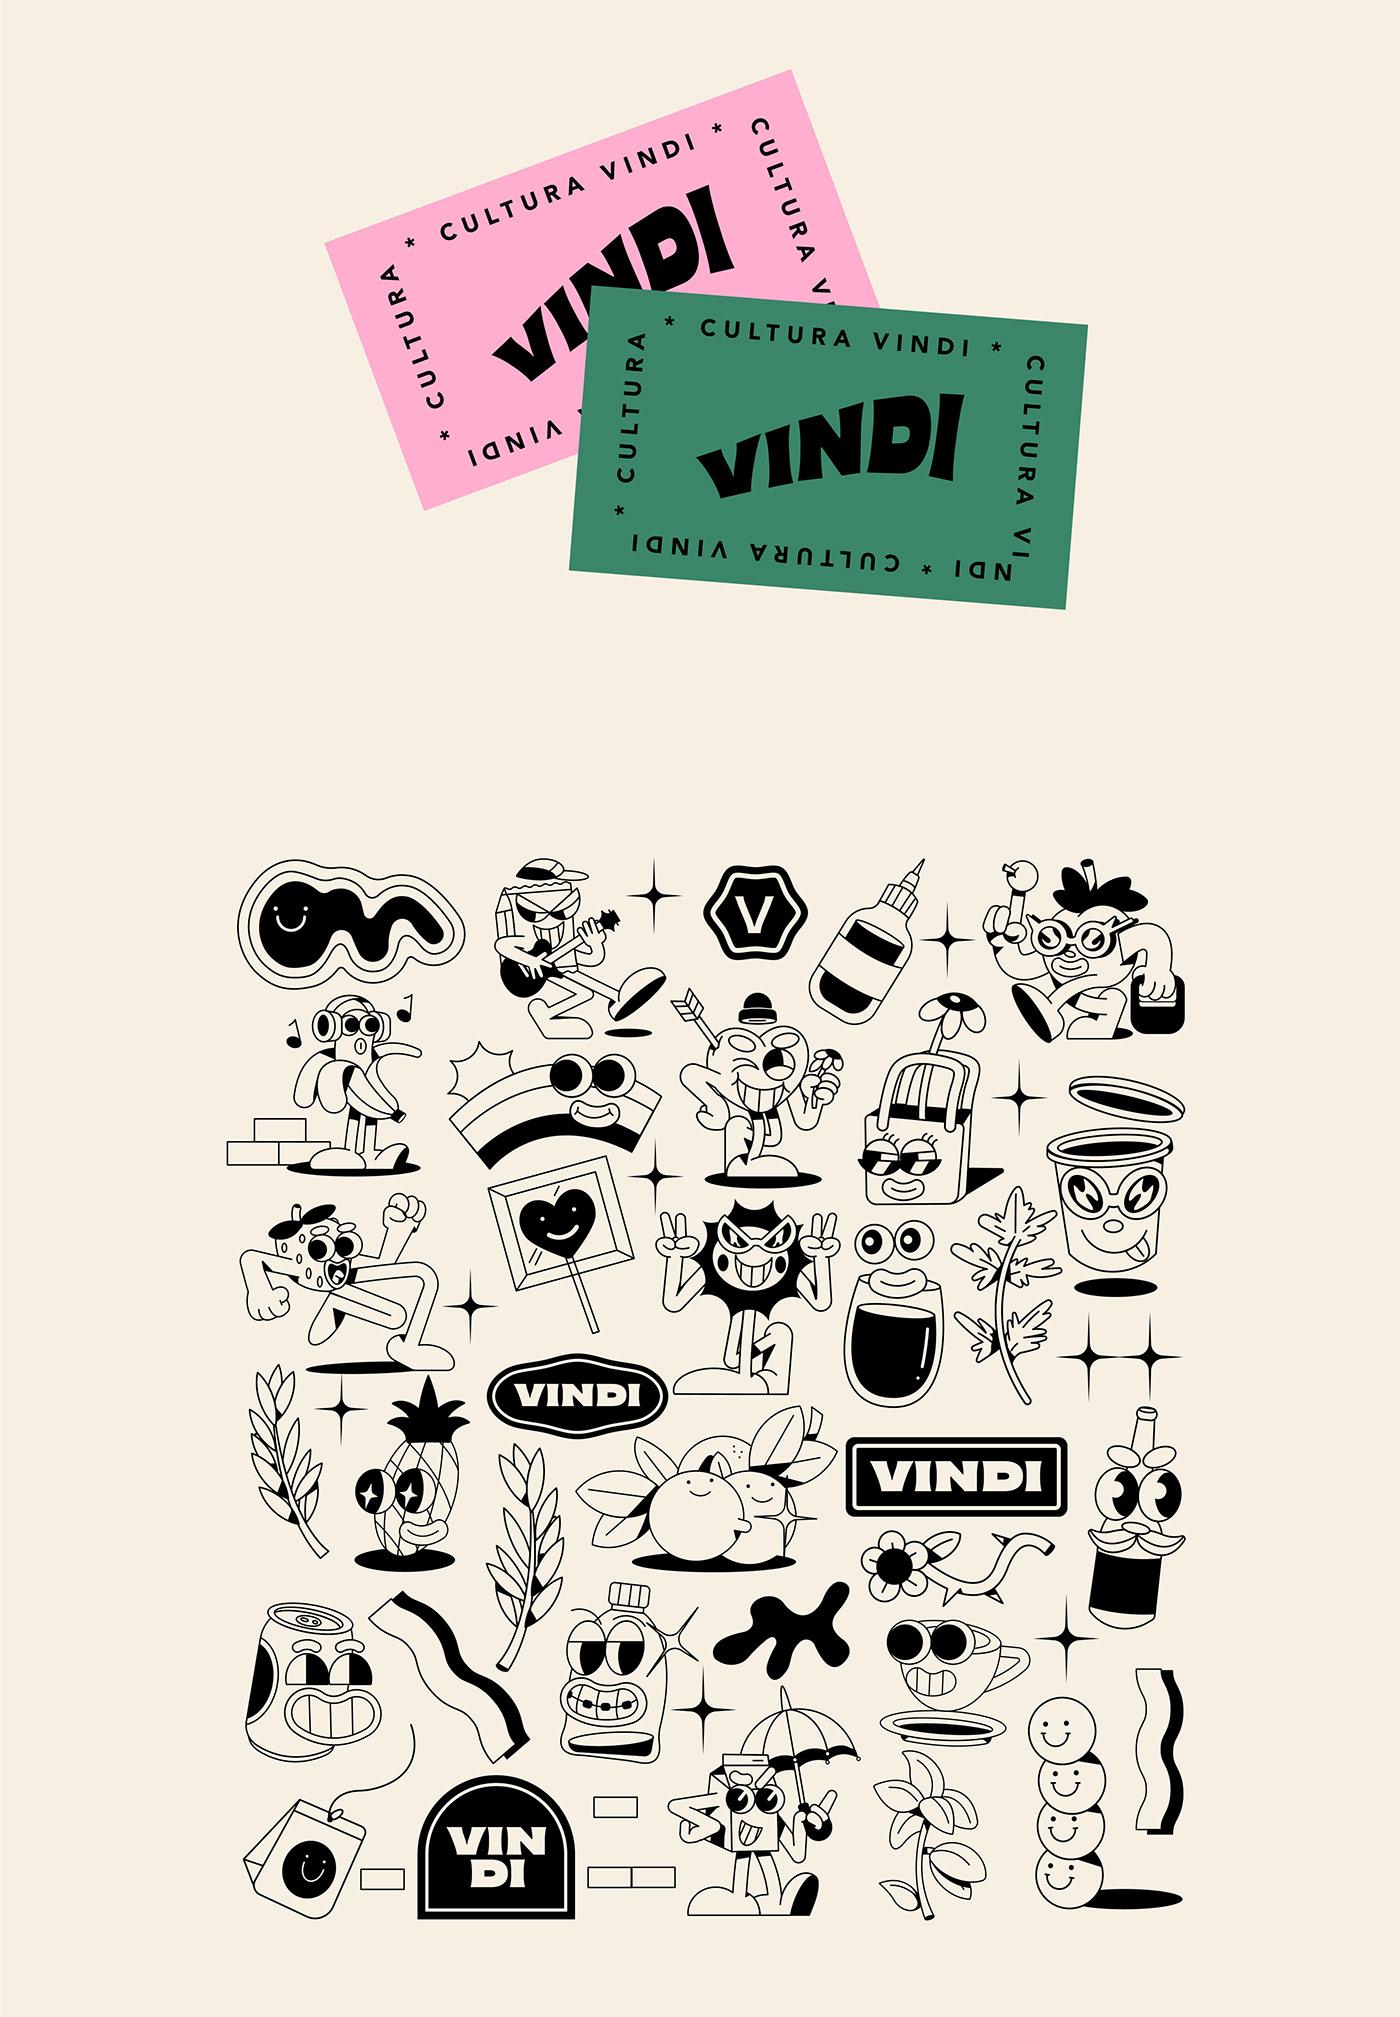 adobeillustrator branding  characterdesign design graphicdesign ILLUSTRATION  poster type vector visualidentity